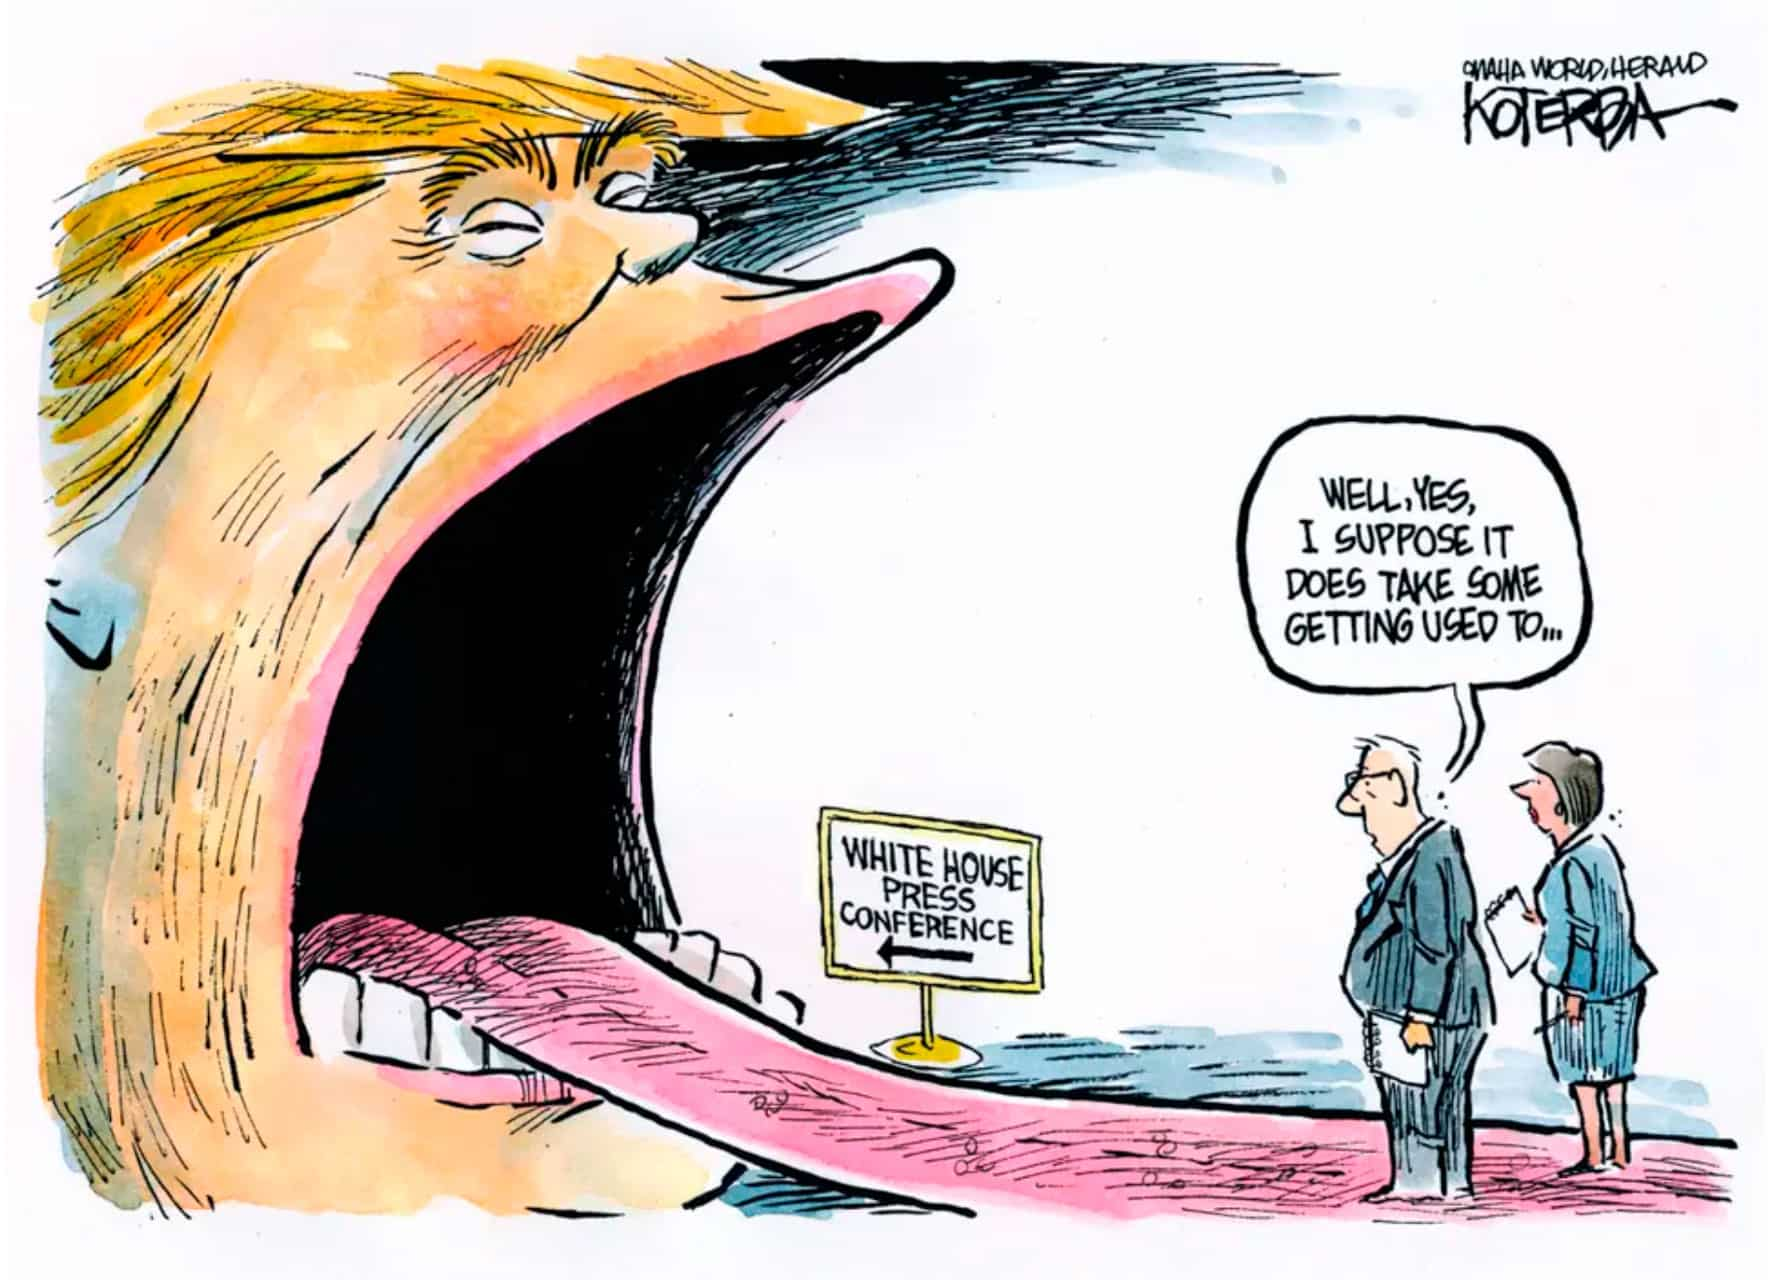 Trumpslation